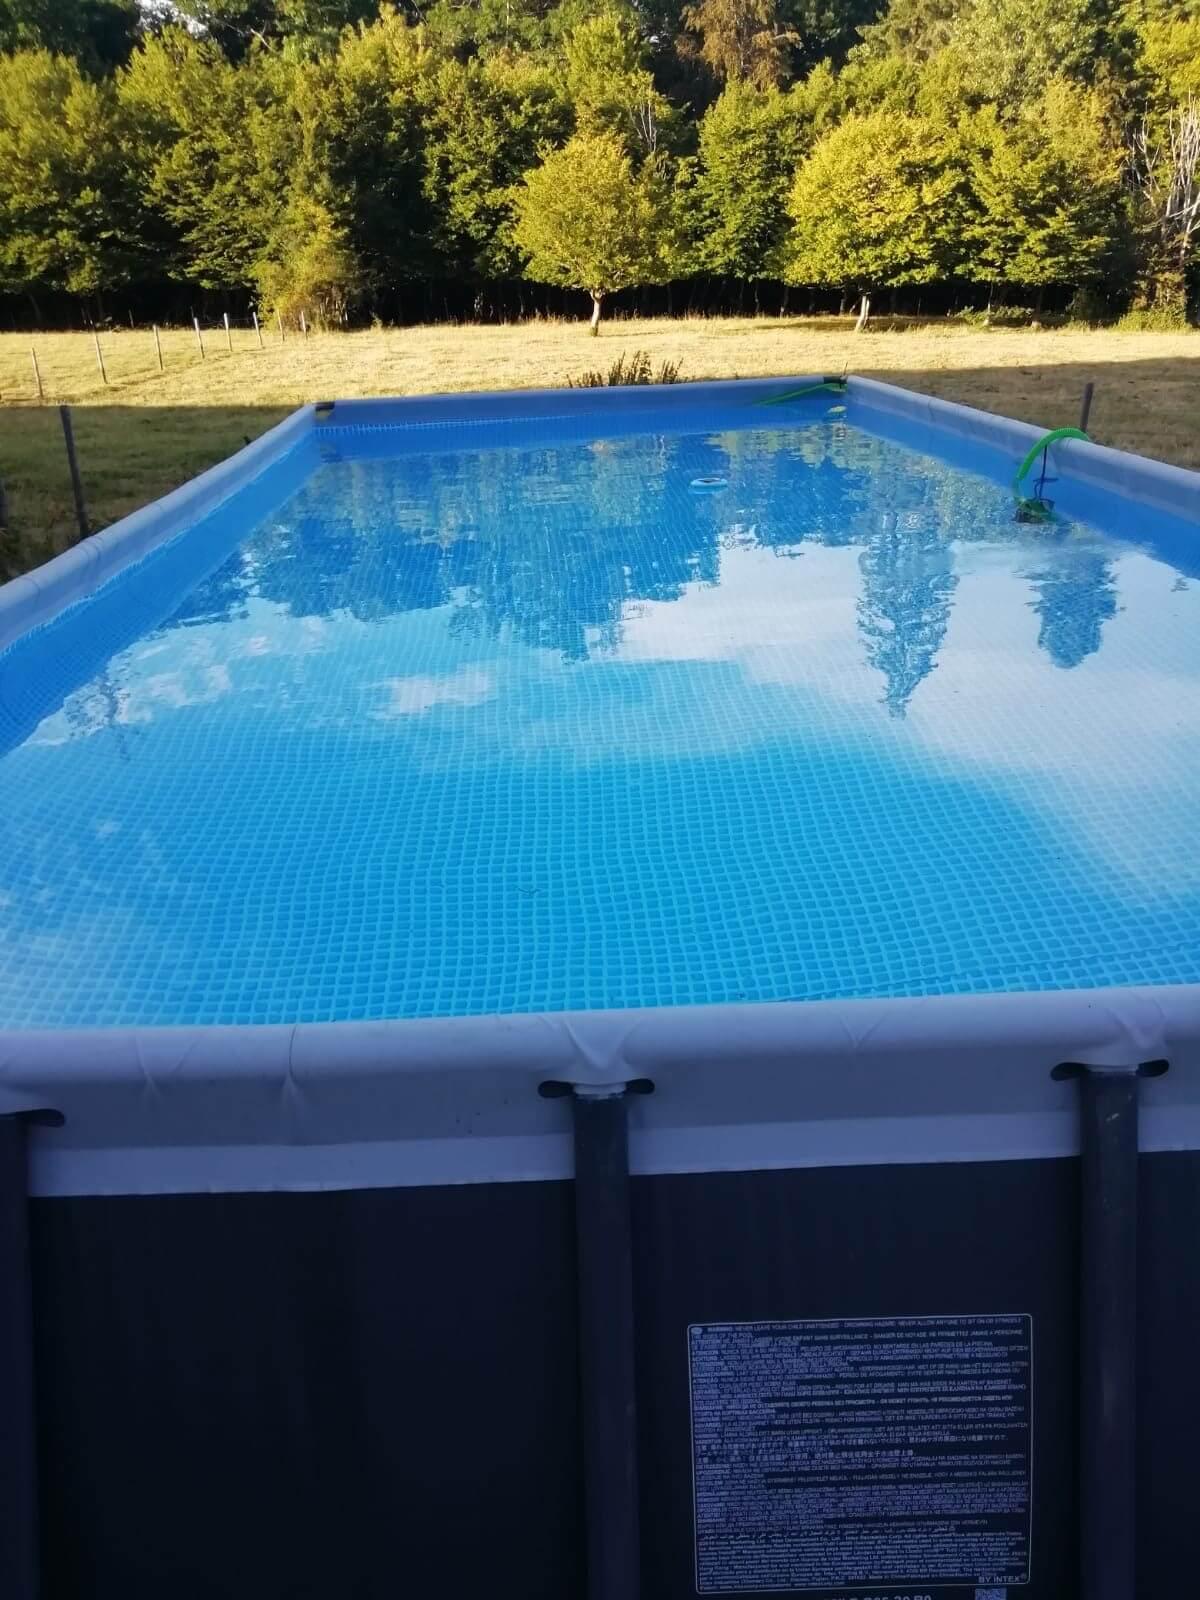 Zwembad in de zomer|Waldfriede